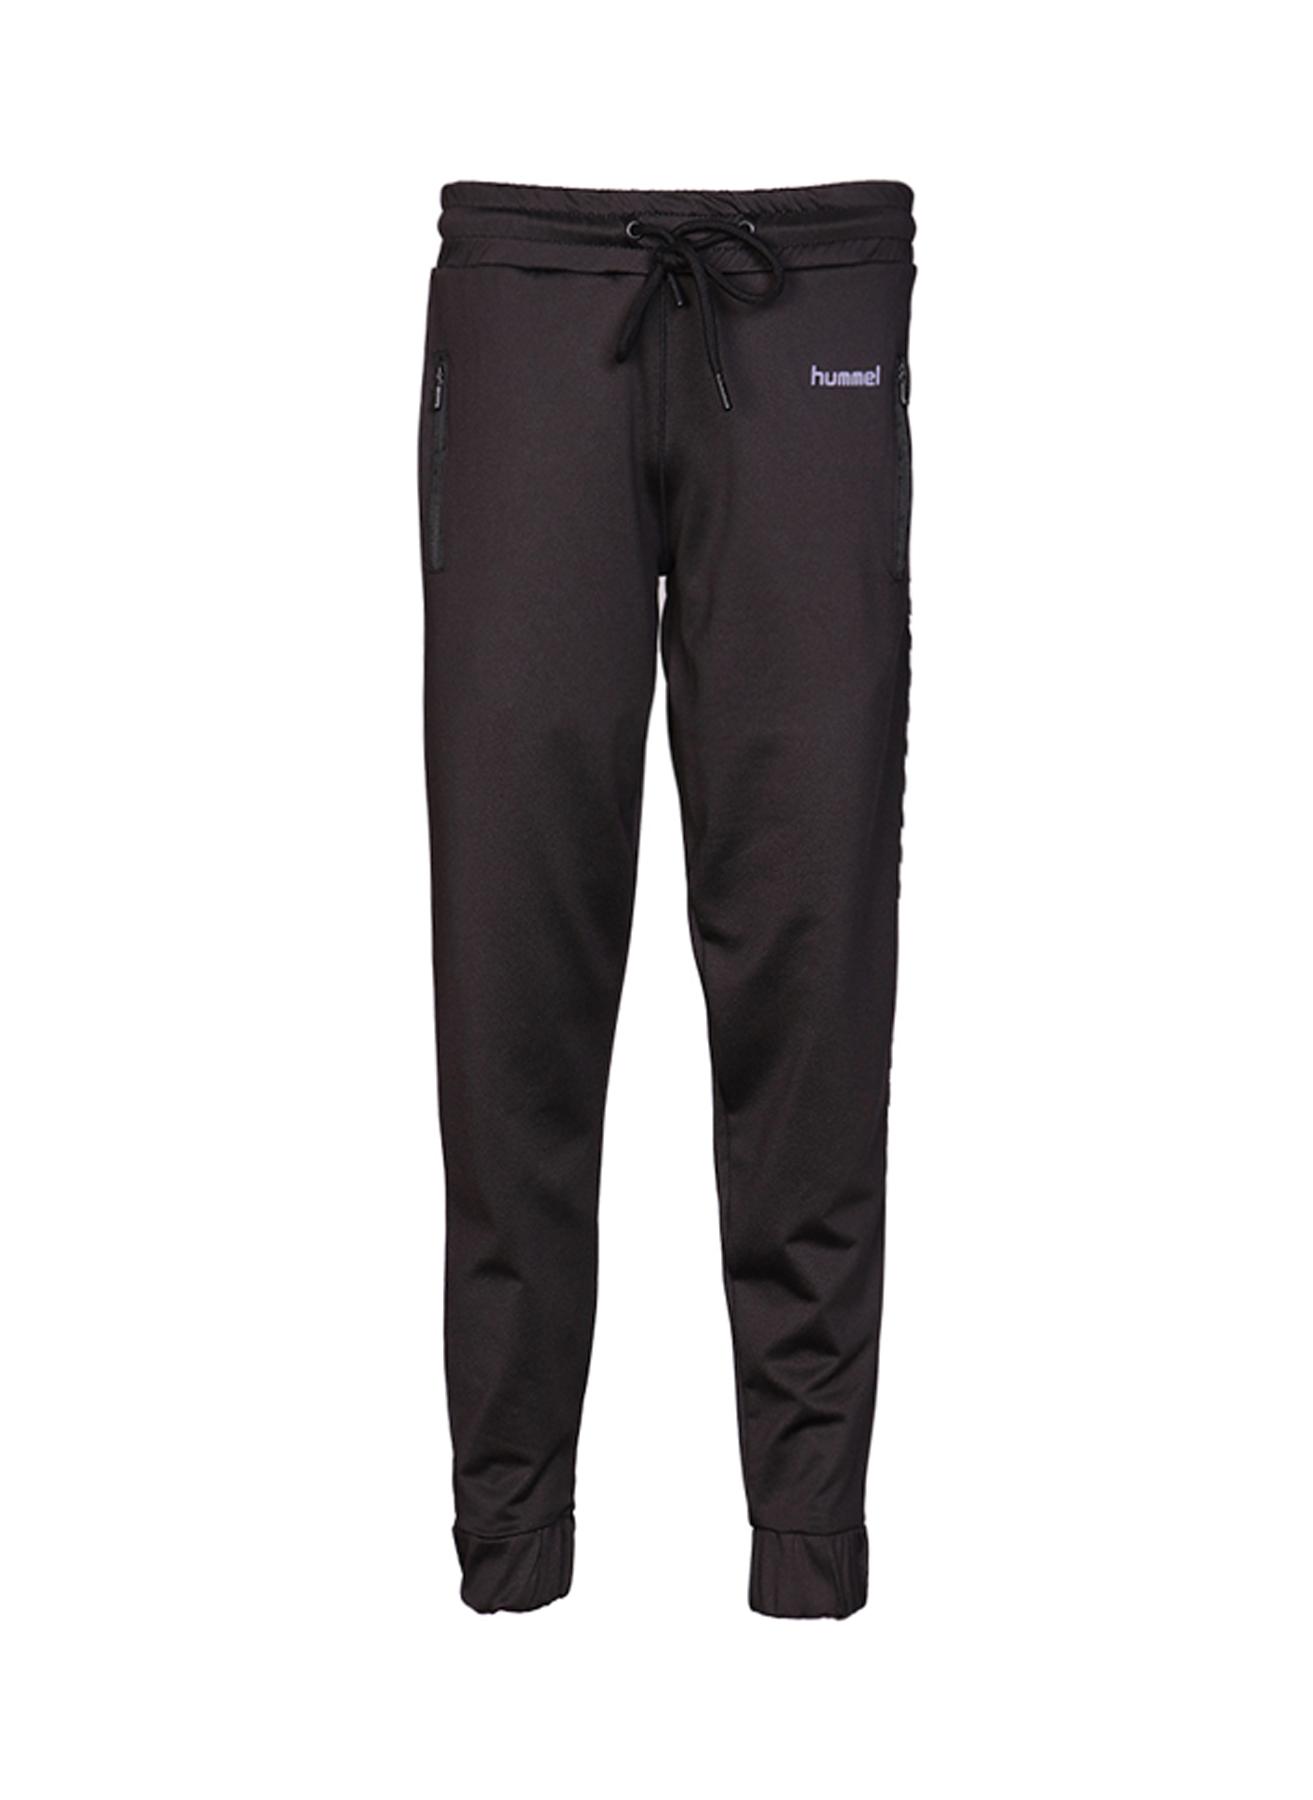 Hummel Pantolon 14 Yaş 876574